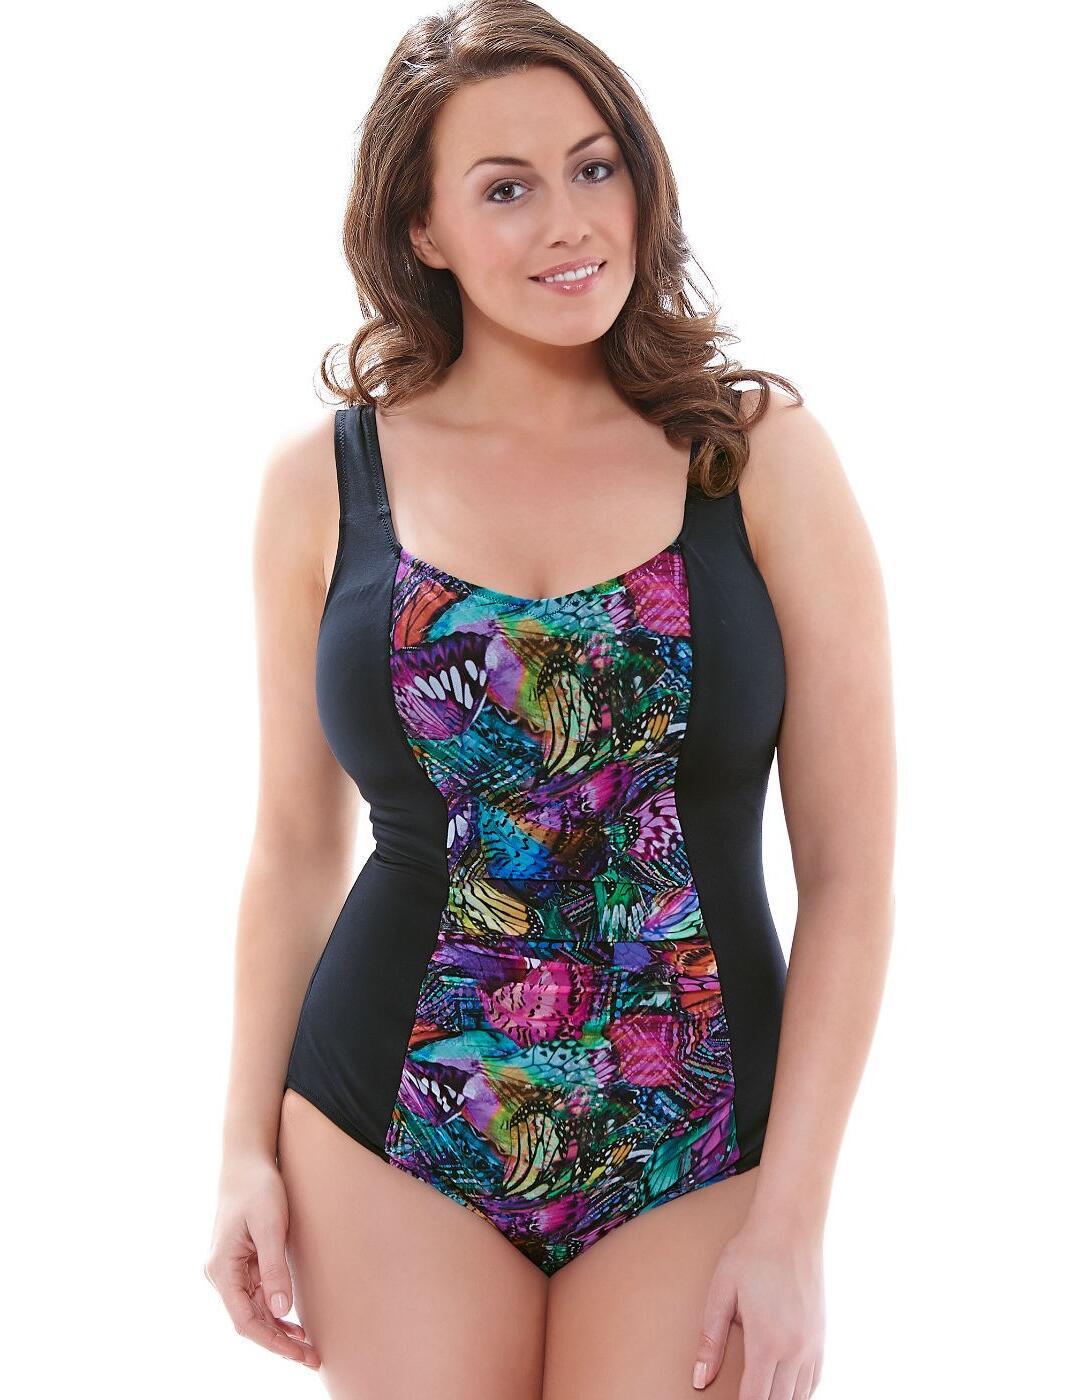 7431 Elomi Kaleidoscope Swimsuit Black - 7431 Swimsuit